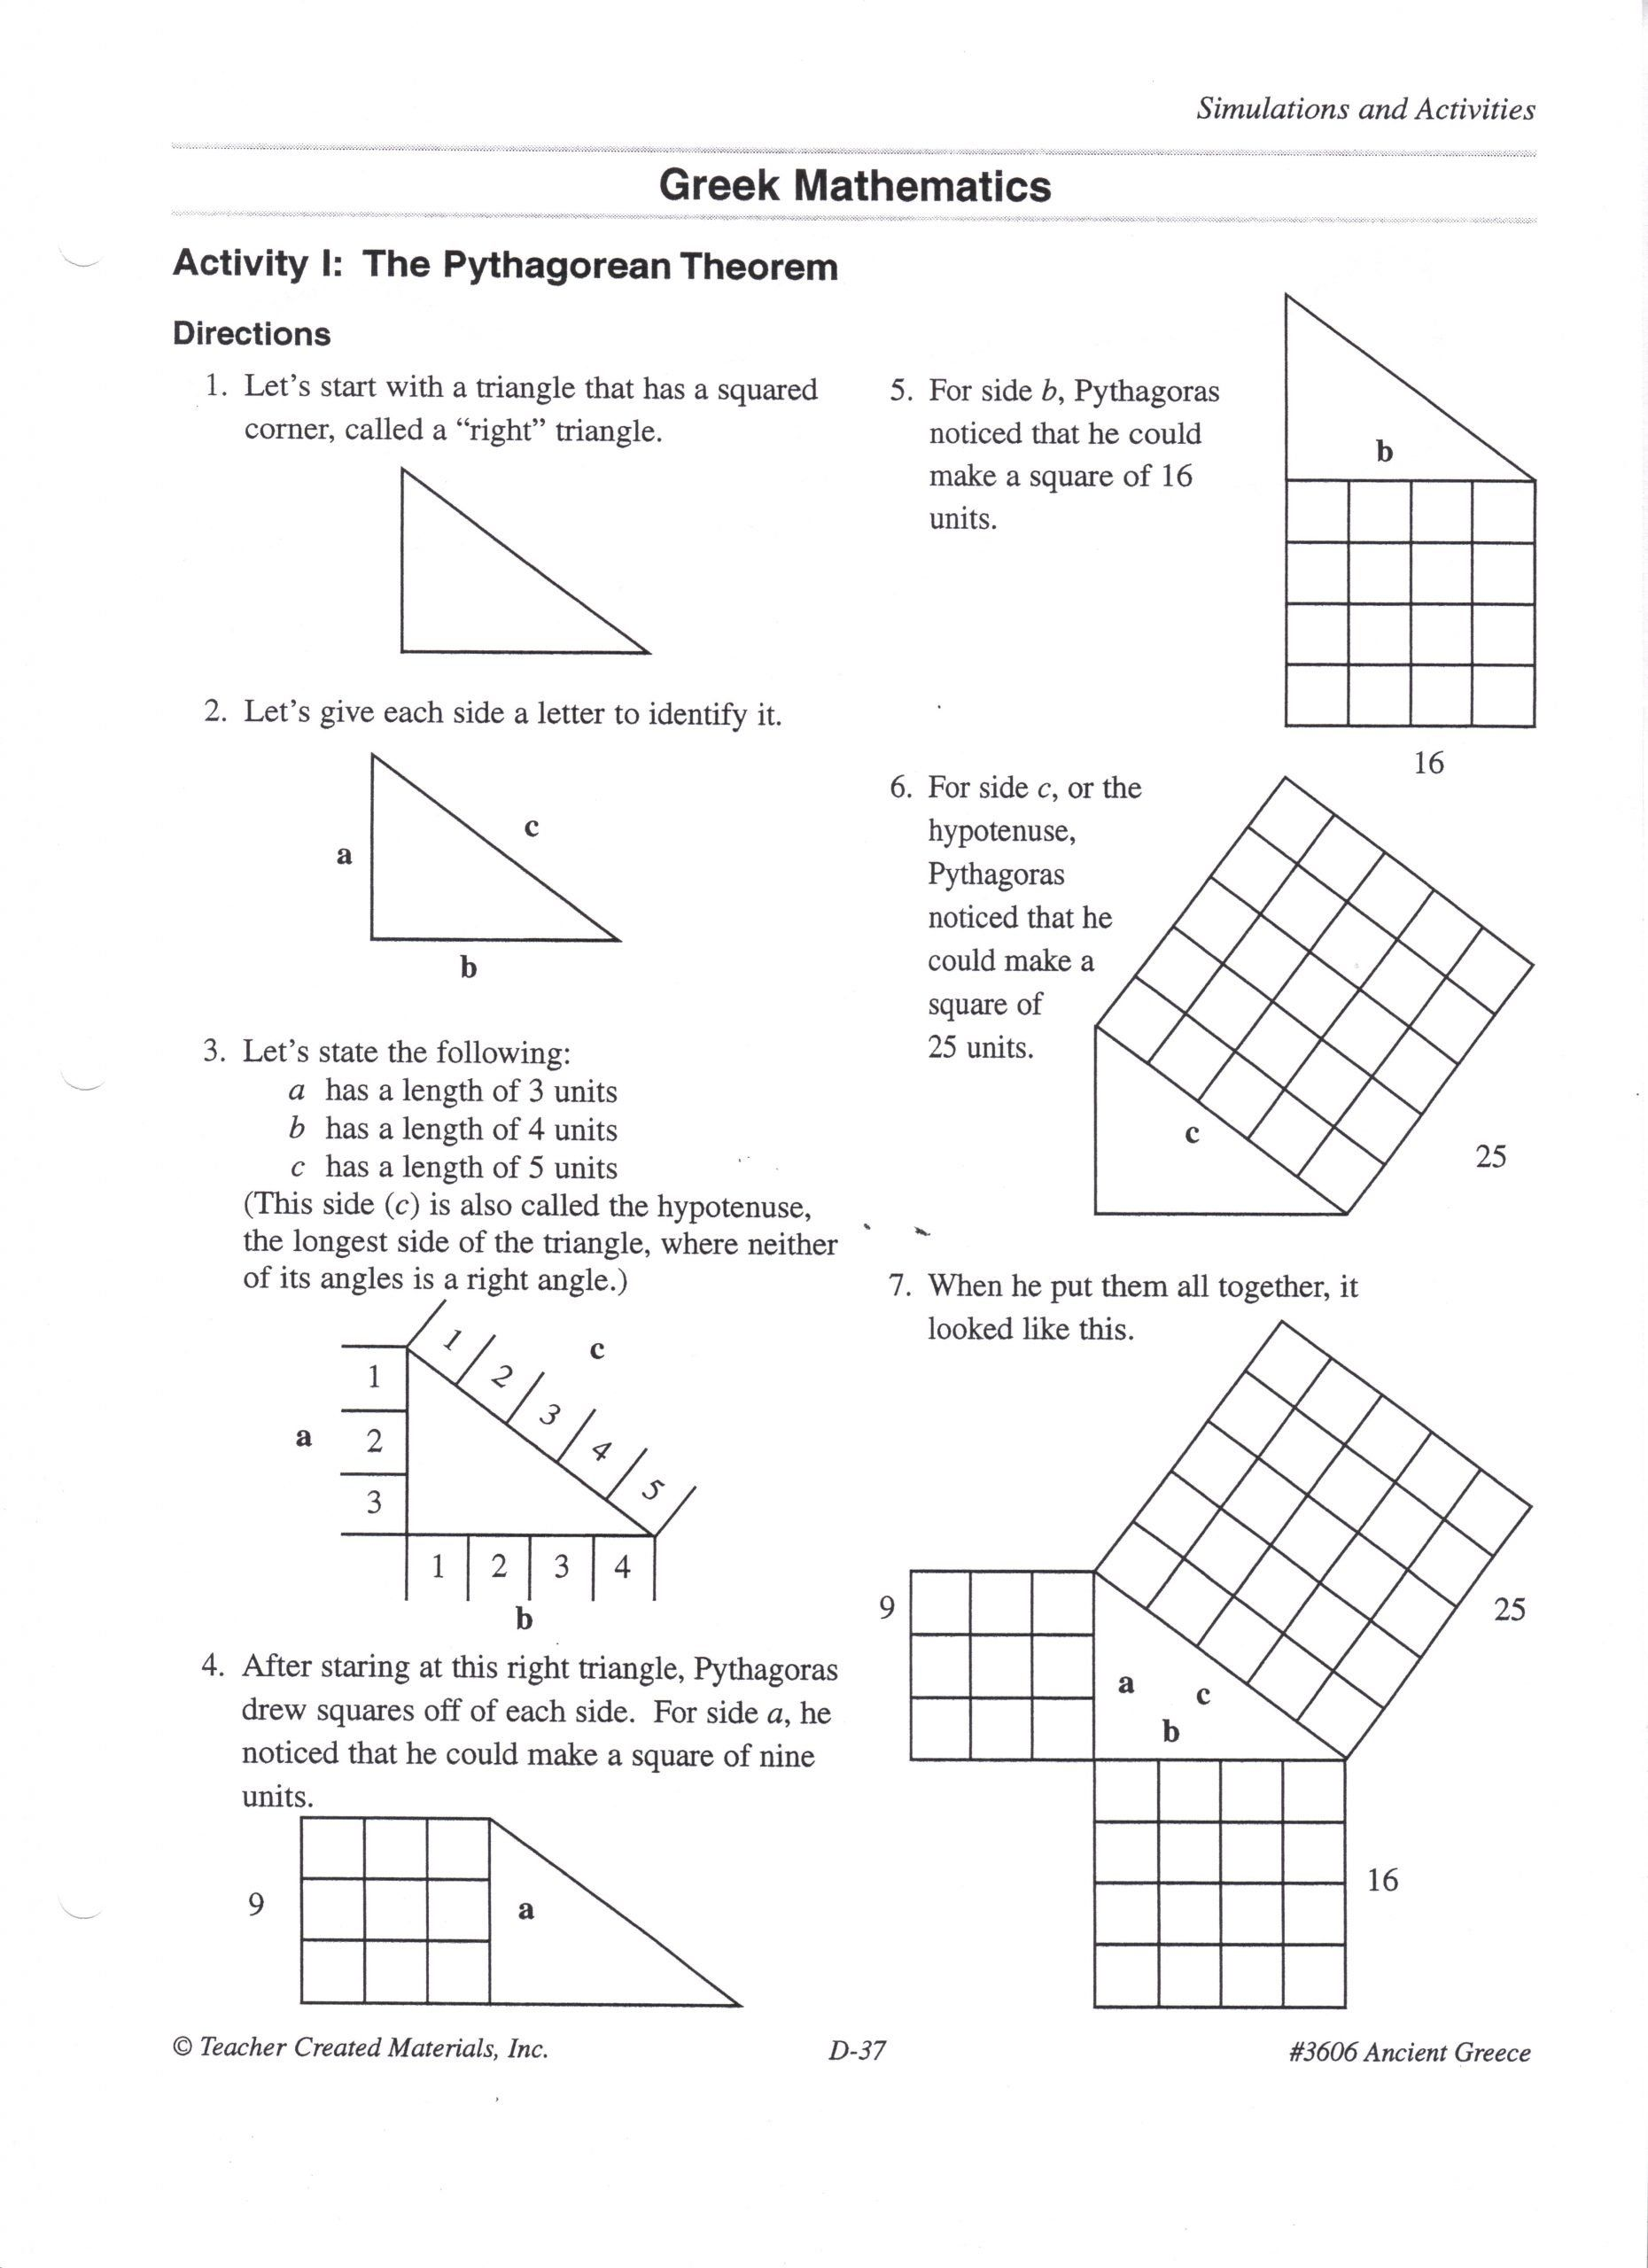 Pythagorean theorem Practice Worksheet Explanation Of why the Pythagorean  theorem Works   Pythagorean theorem [ 2560 x 1860 Pixel ]